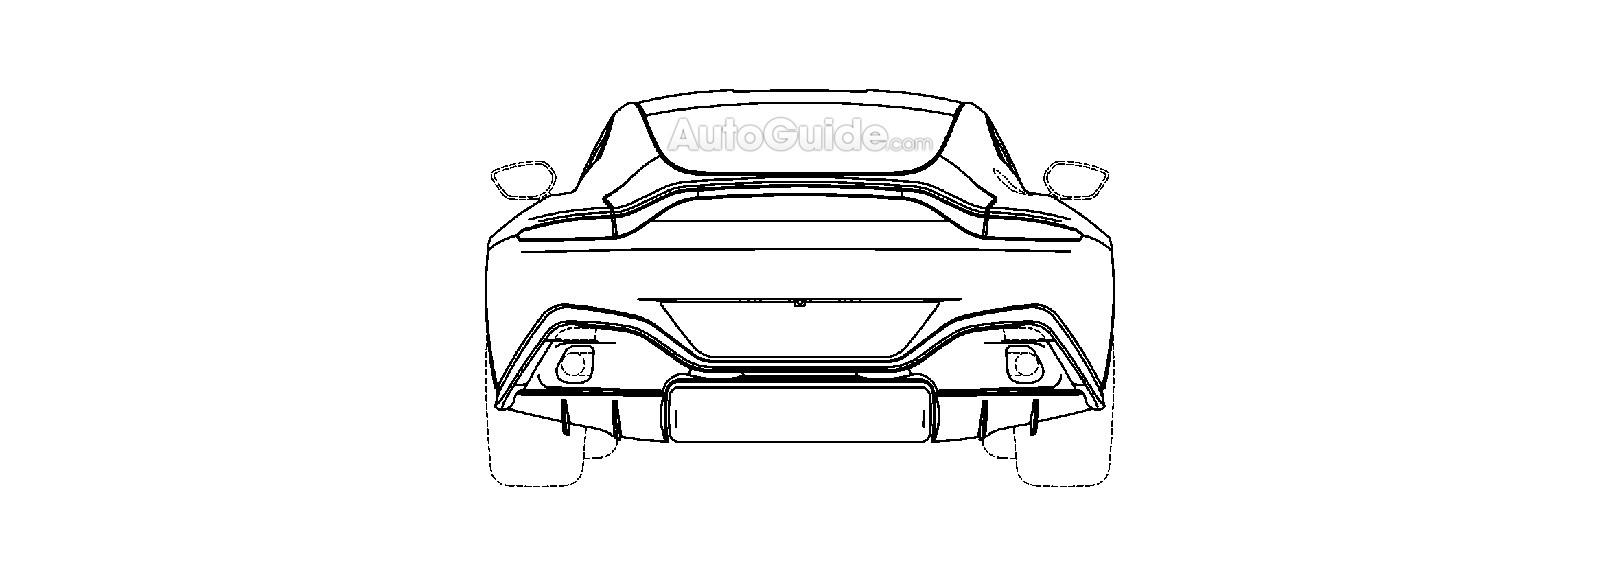 2019 Aston Martin Vantage Specifications Teased: M177 V8